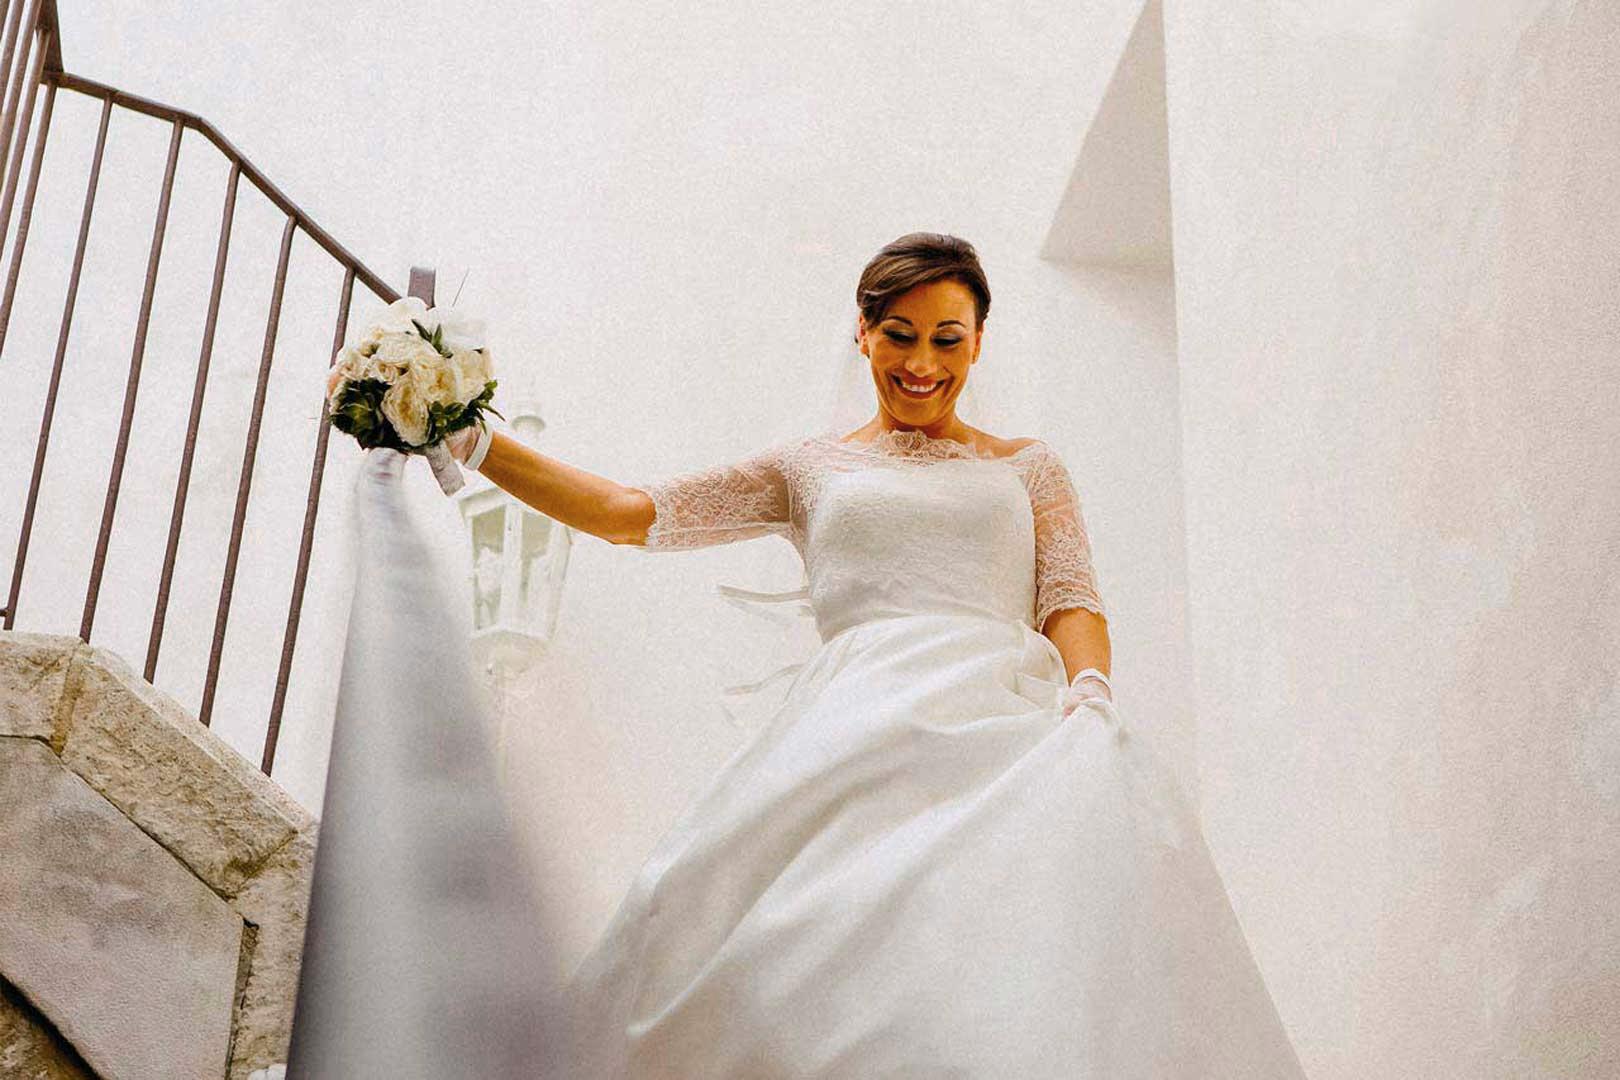 011-sposa-foggia-gianni-lepore-fotografo-lucera